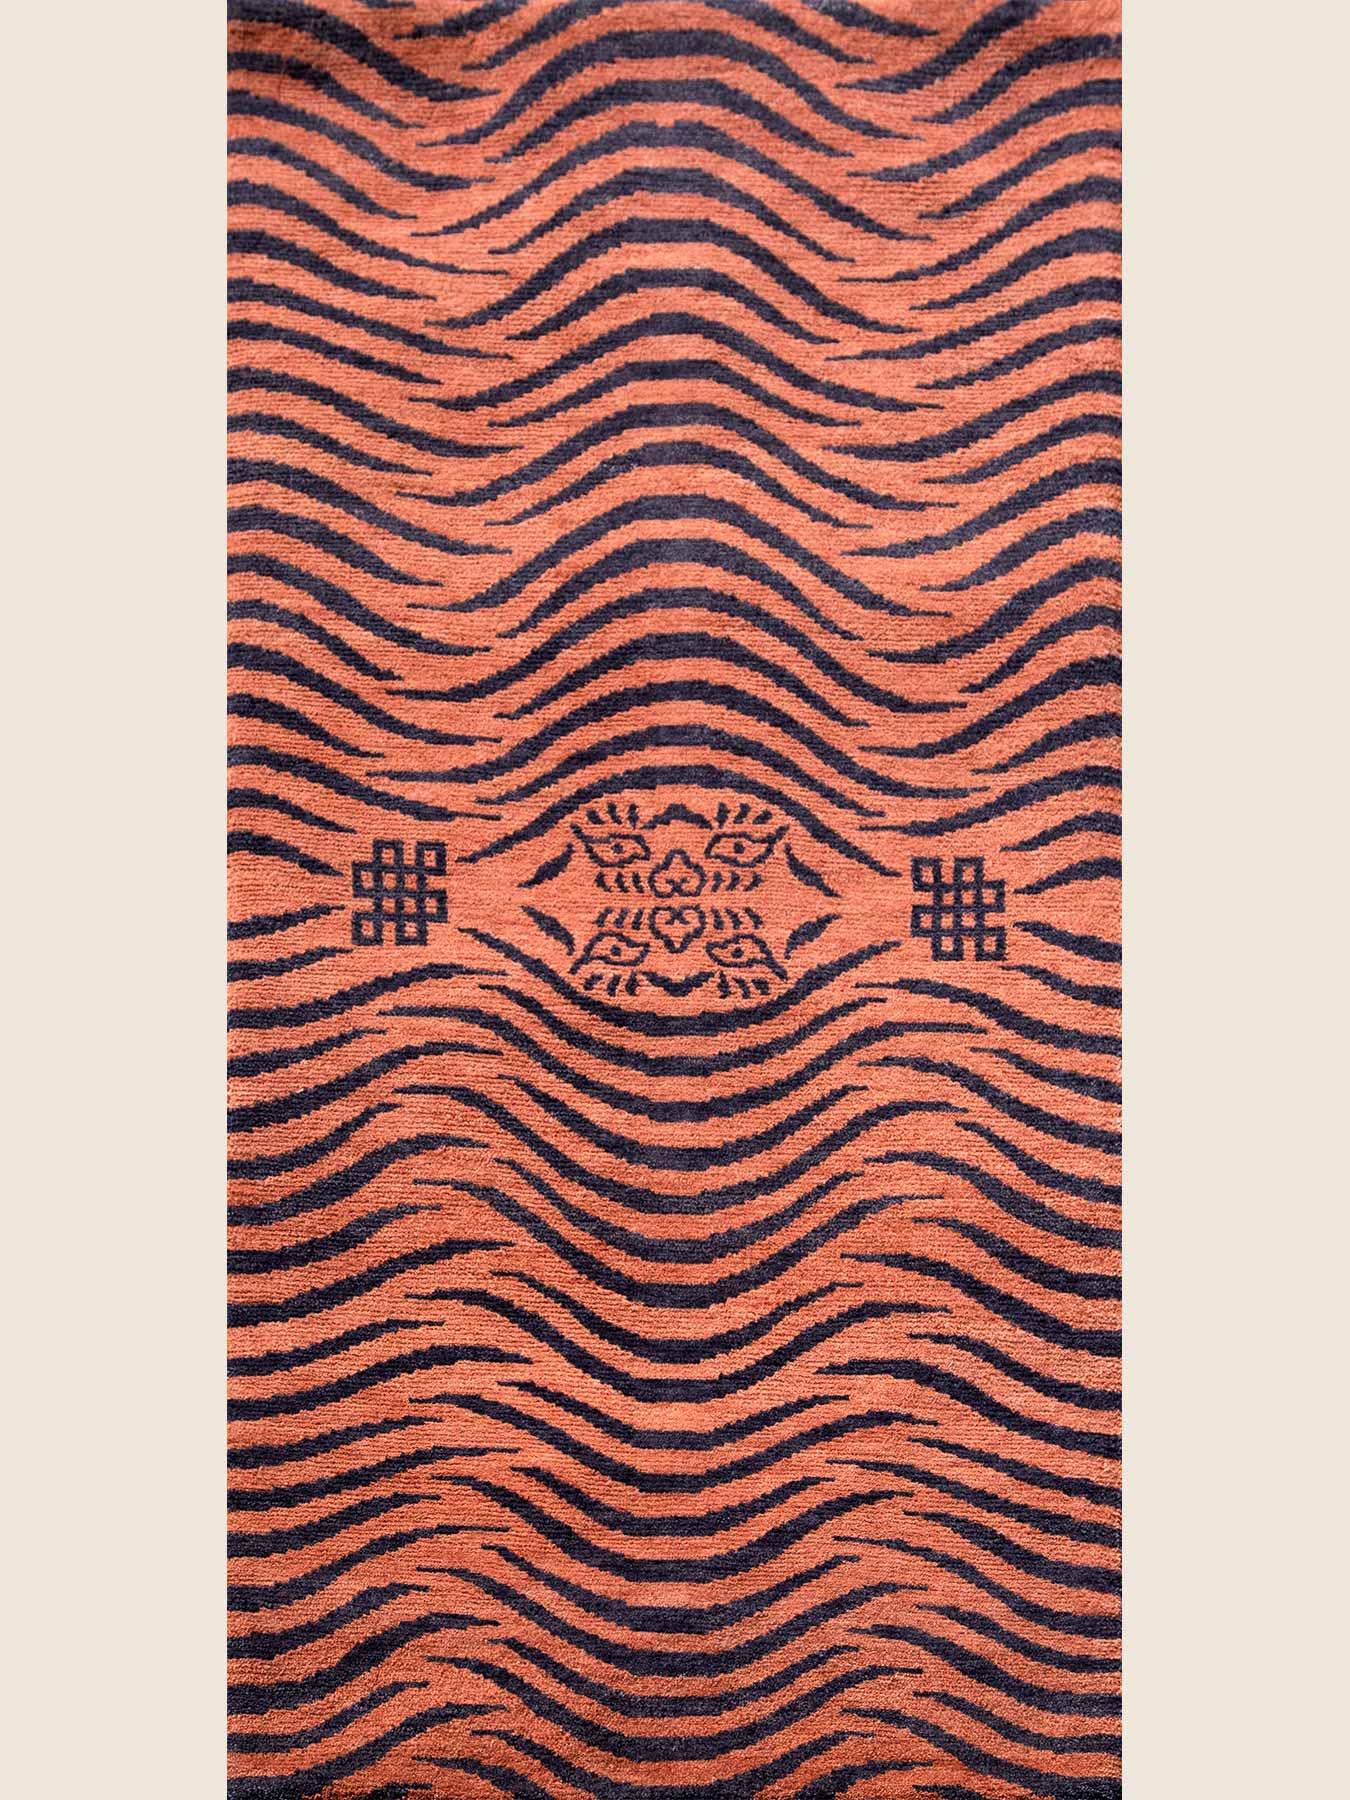 skin on tiger back pattern zt-01